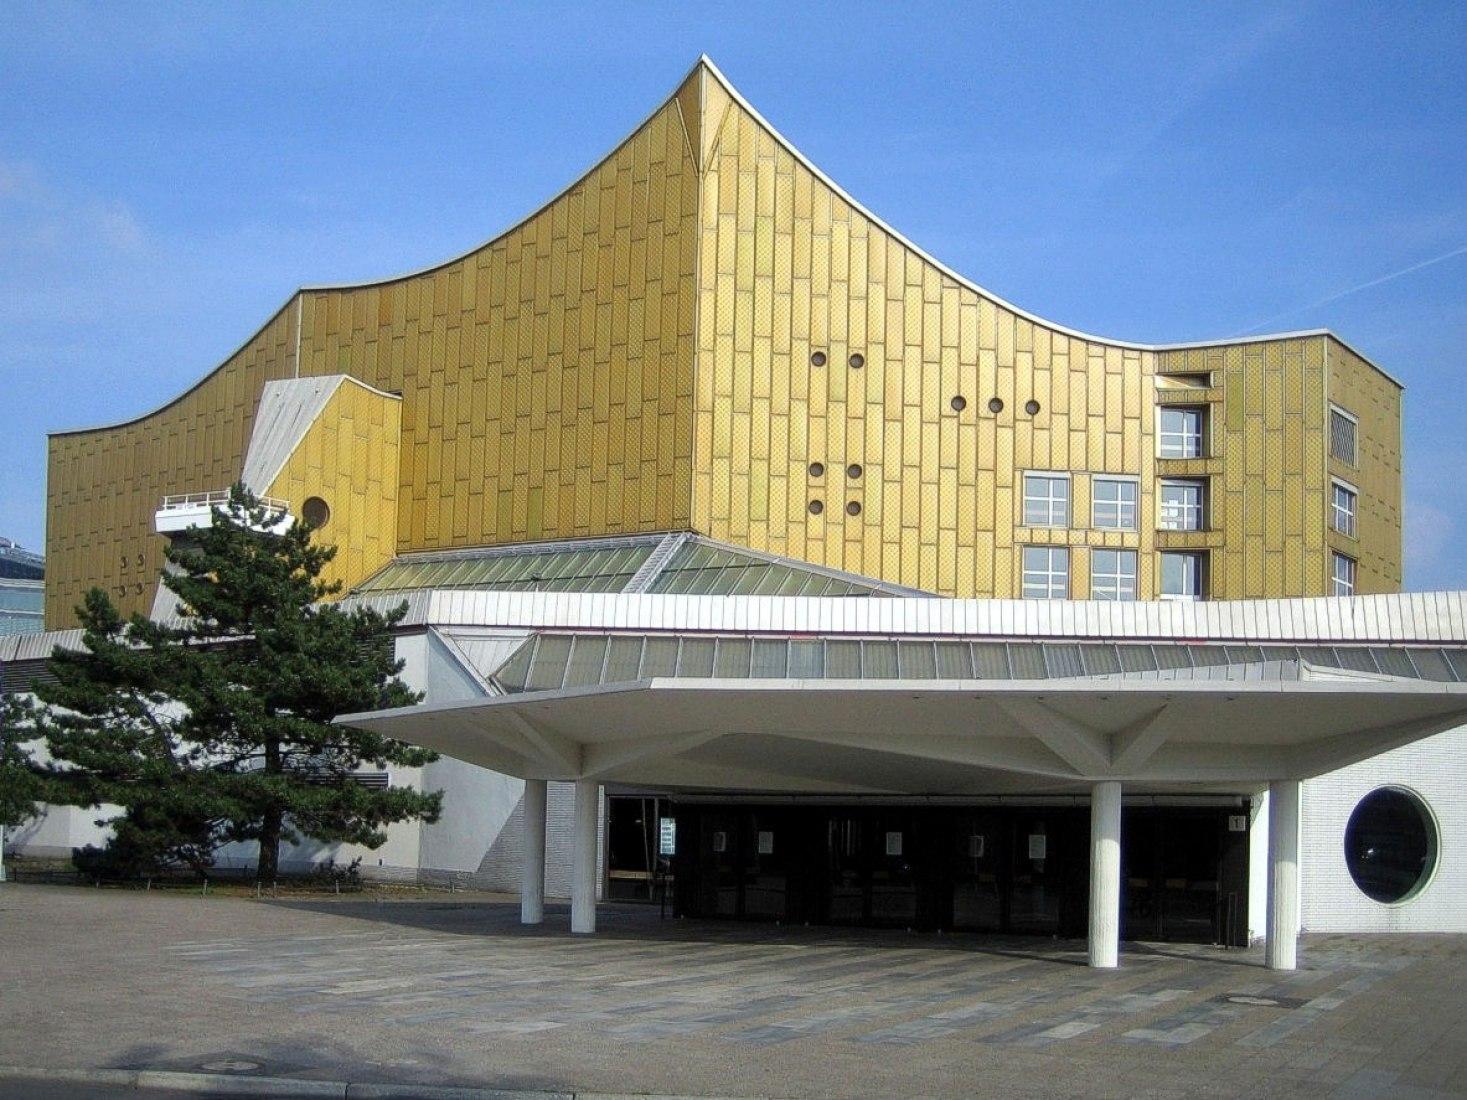 Wim Wenders (Alemania) - Filarmónica de Berlín en Berlín, Alemania. Imagen a través de Wikimedia Commons.